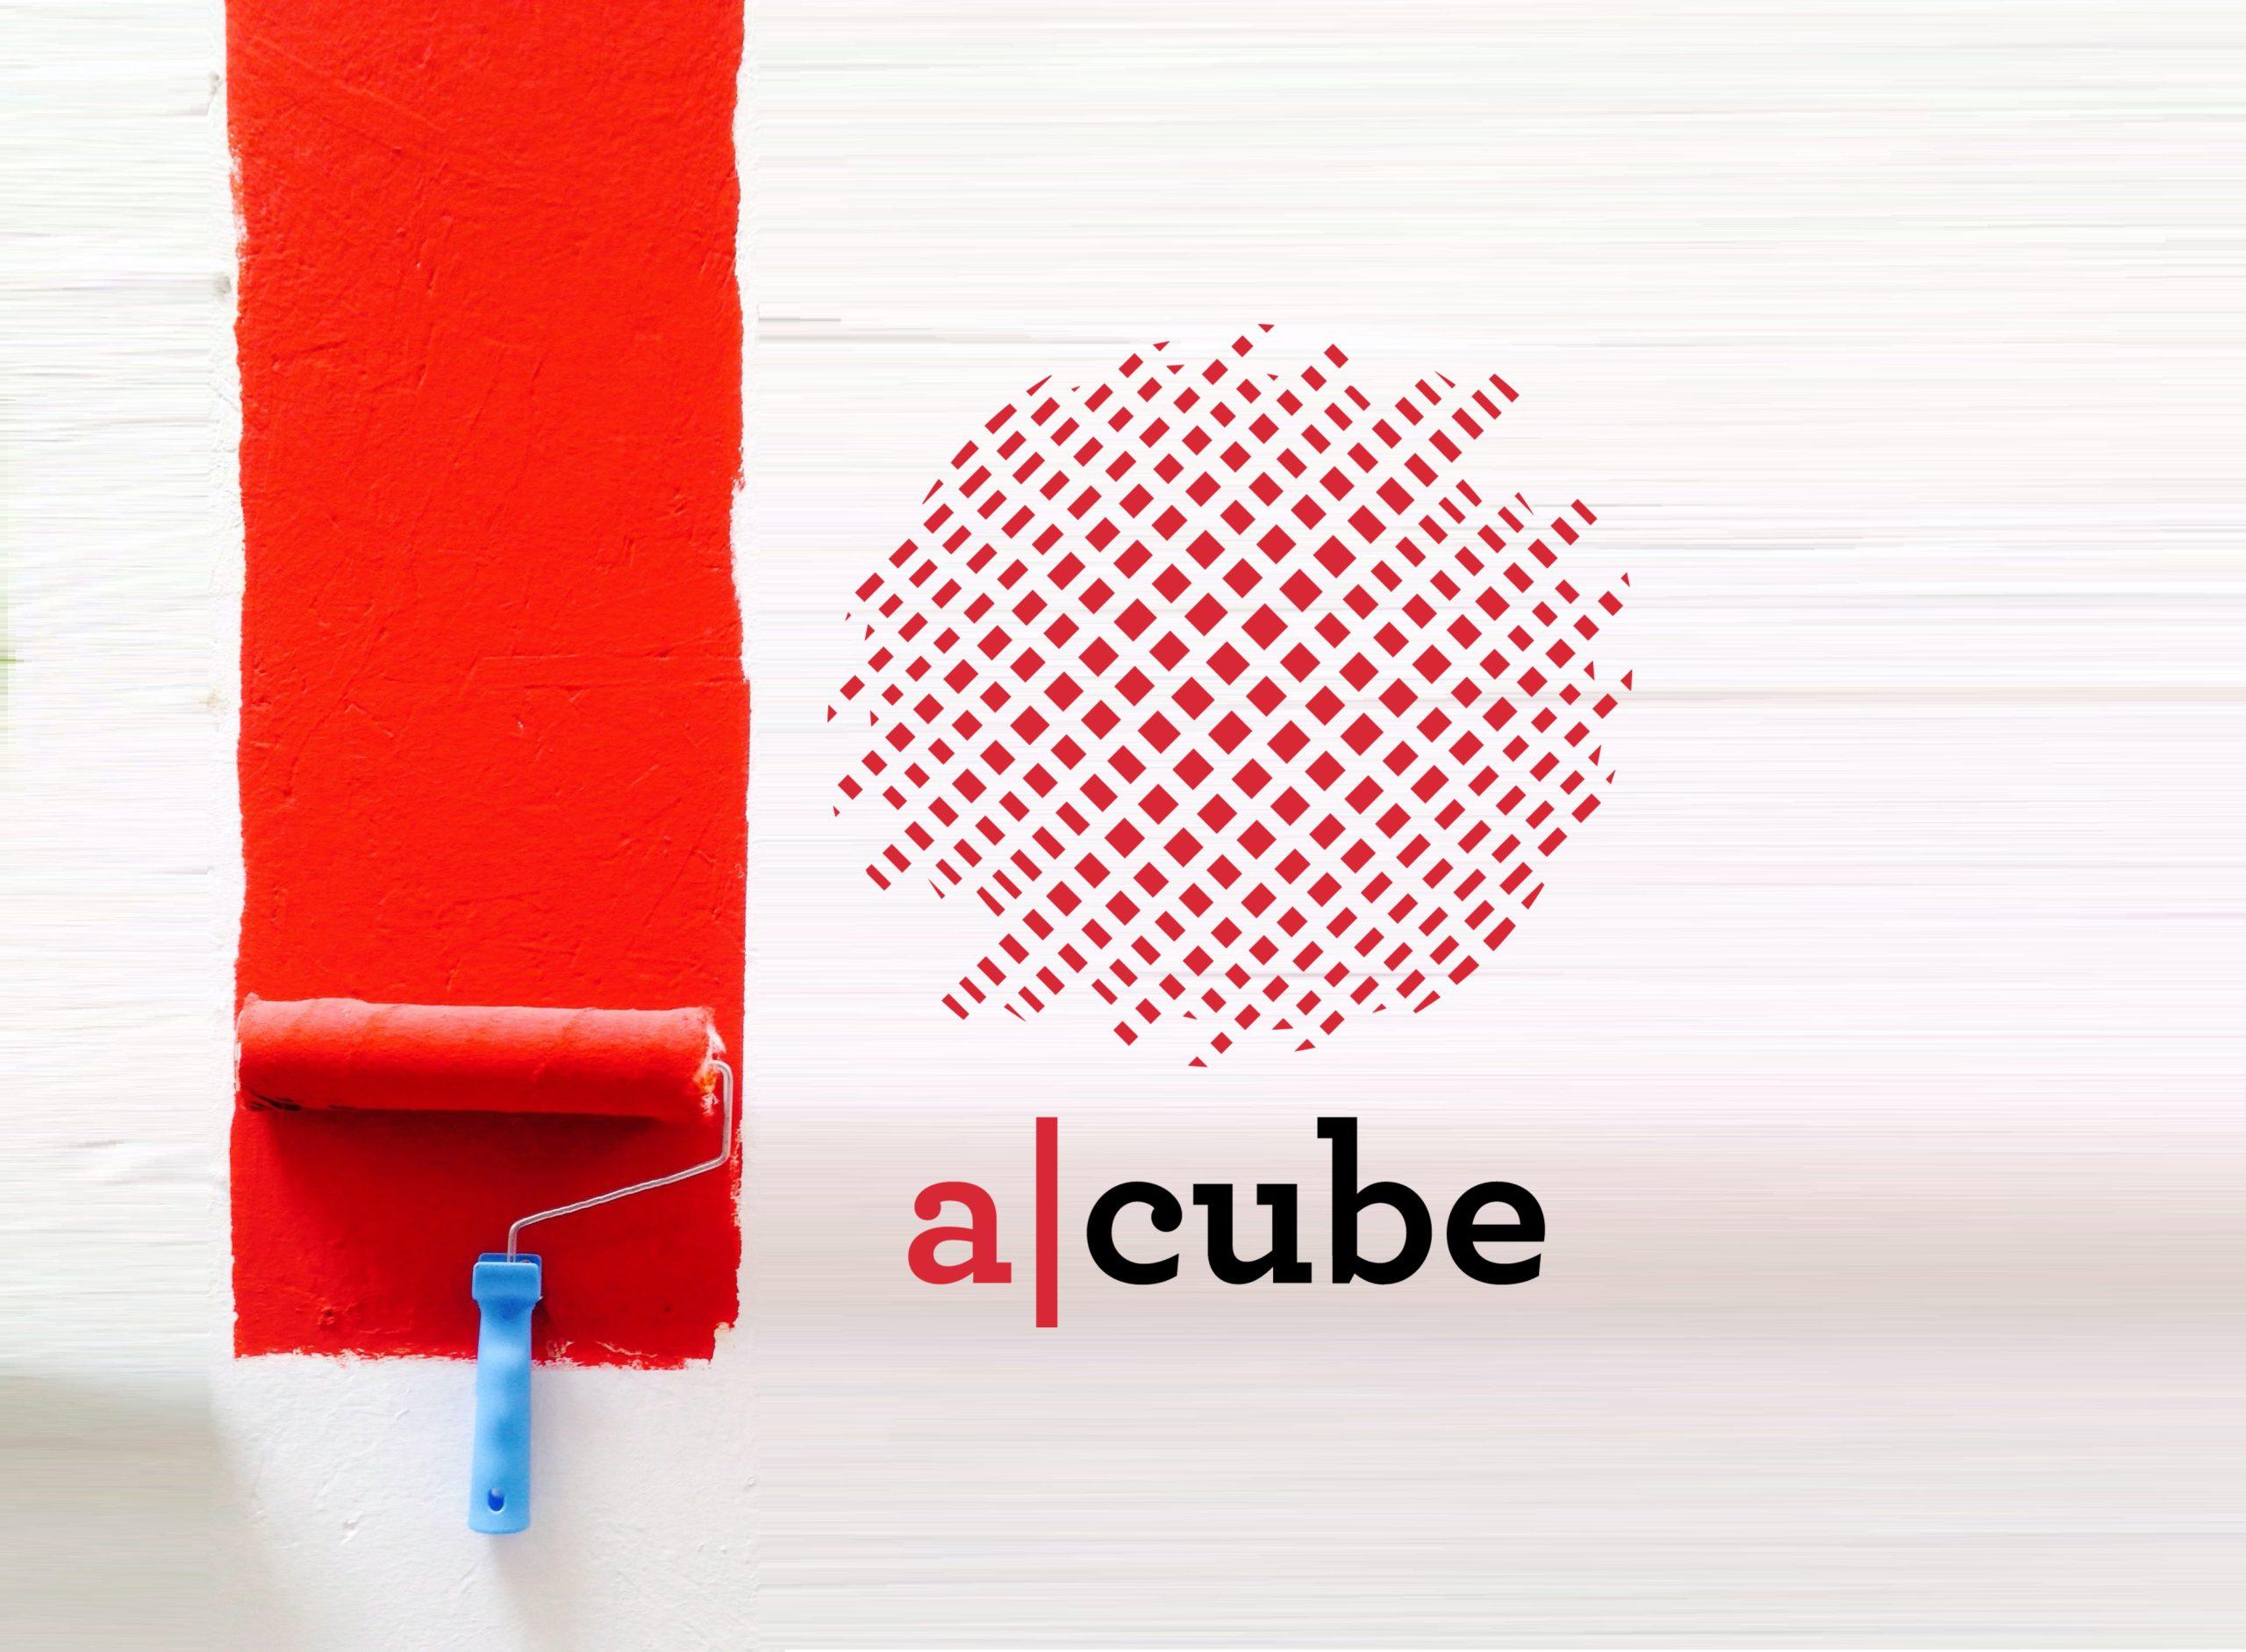 Make a Cube³ diventa a|cube